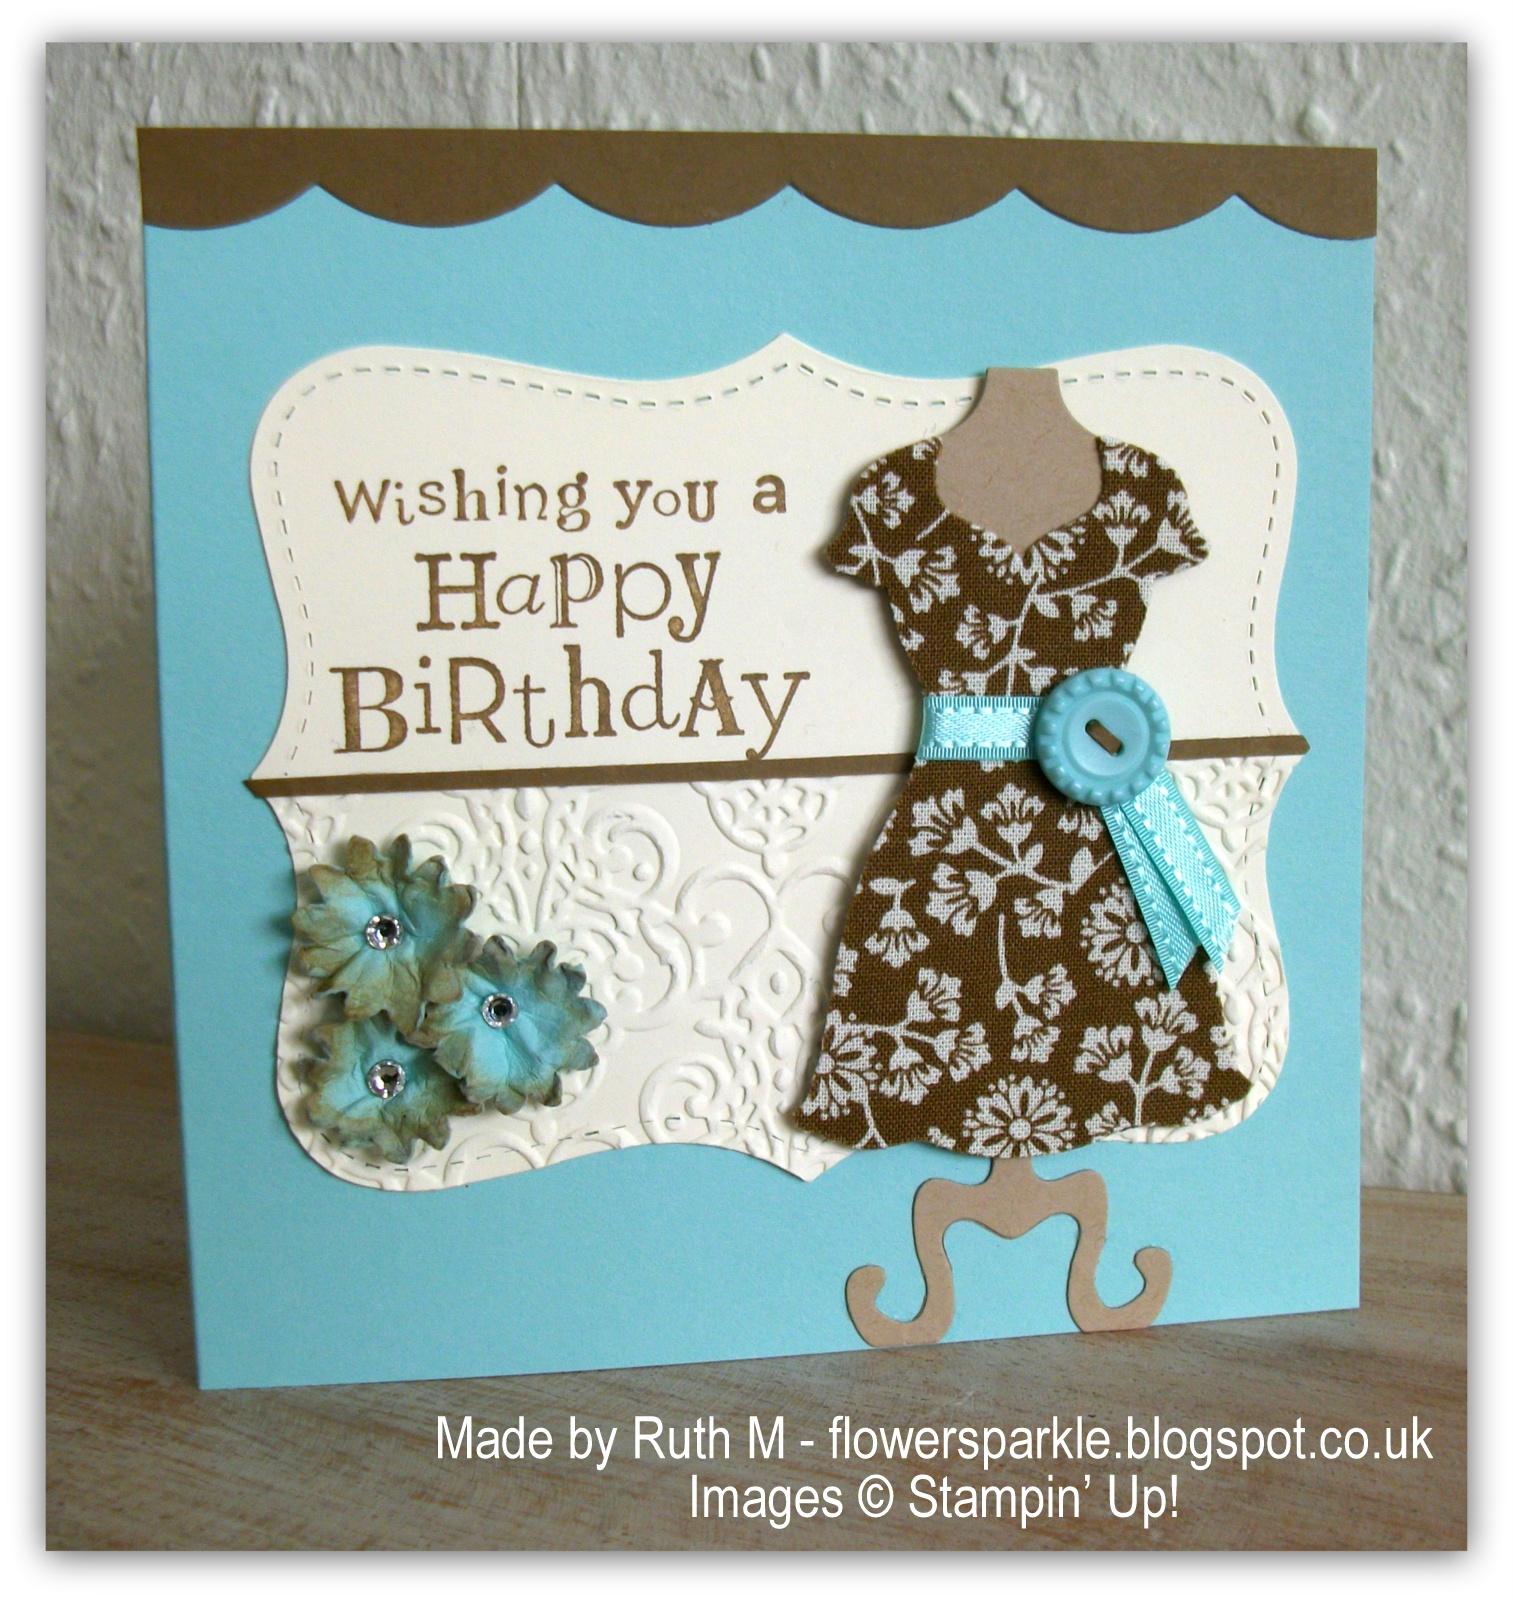 Flower Sparkle Fabric Dress Happy Birthday Card